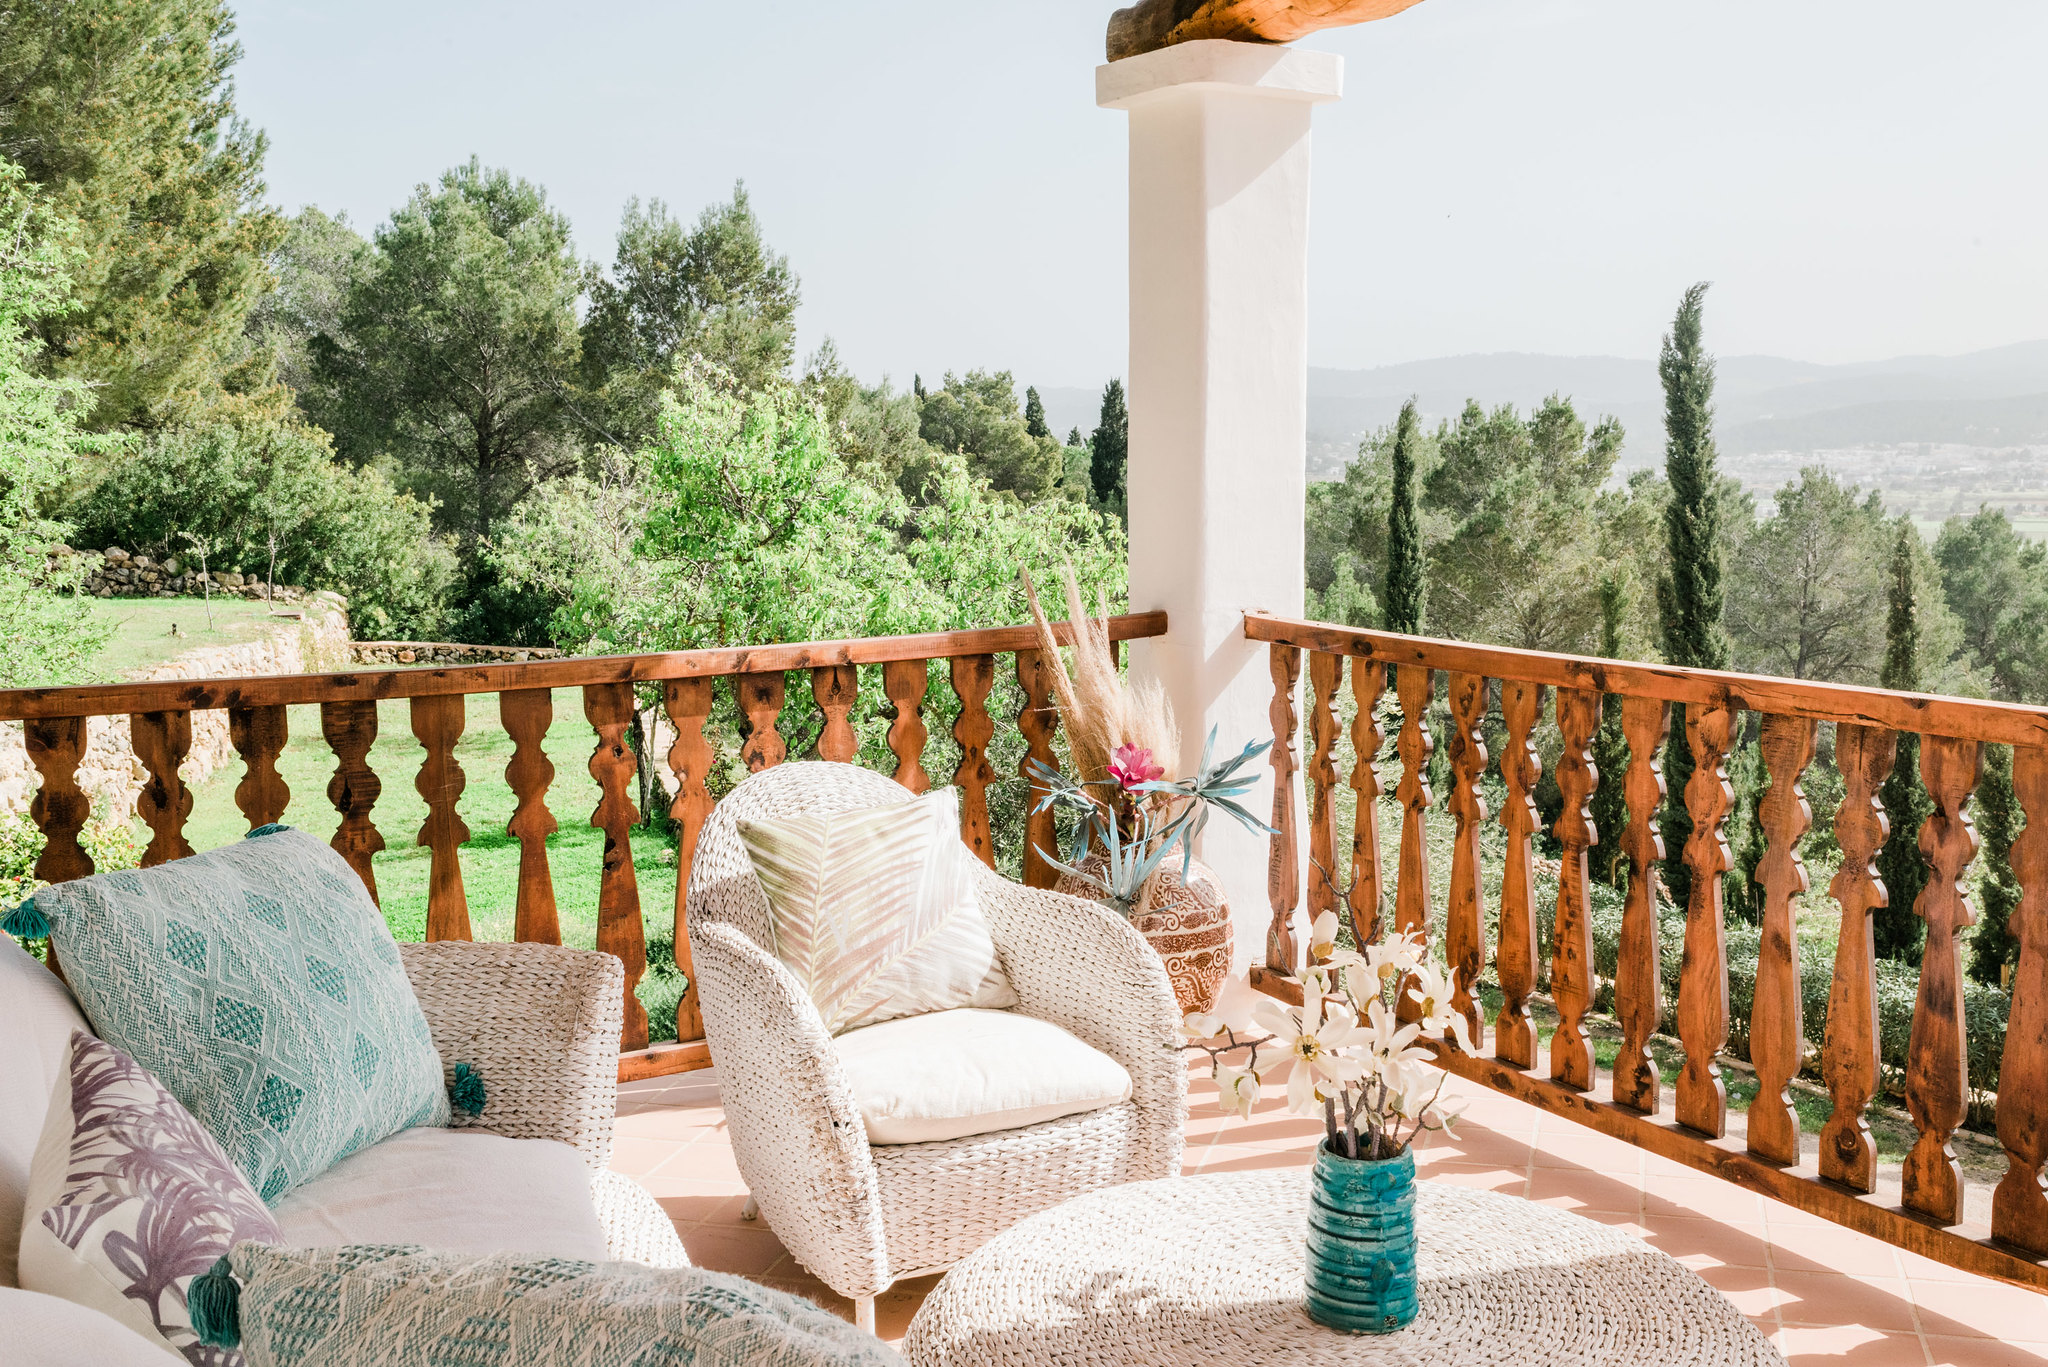 https://www.white-ibiza.com/wp-content/uploads/2020/06/white-ibiza-villas-los-corrales-exterior-terrace.jpg